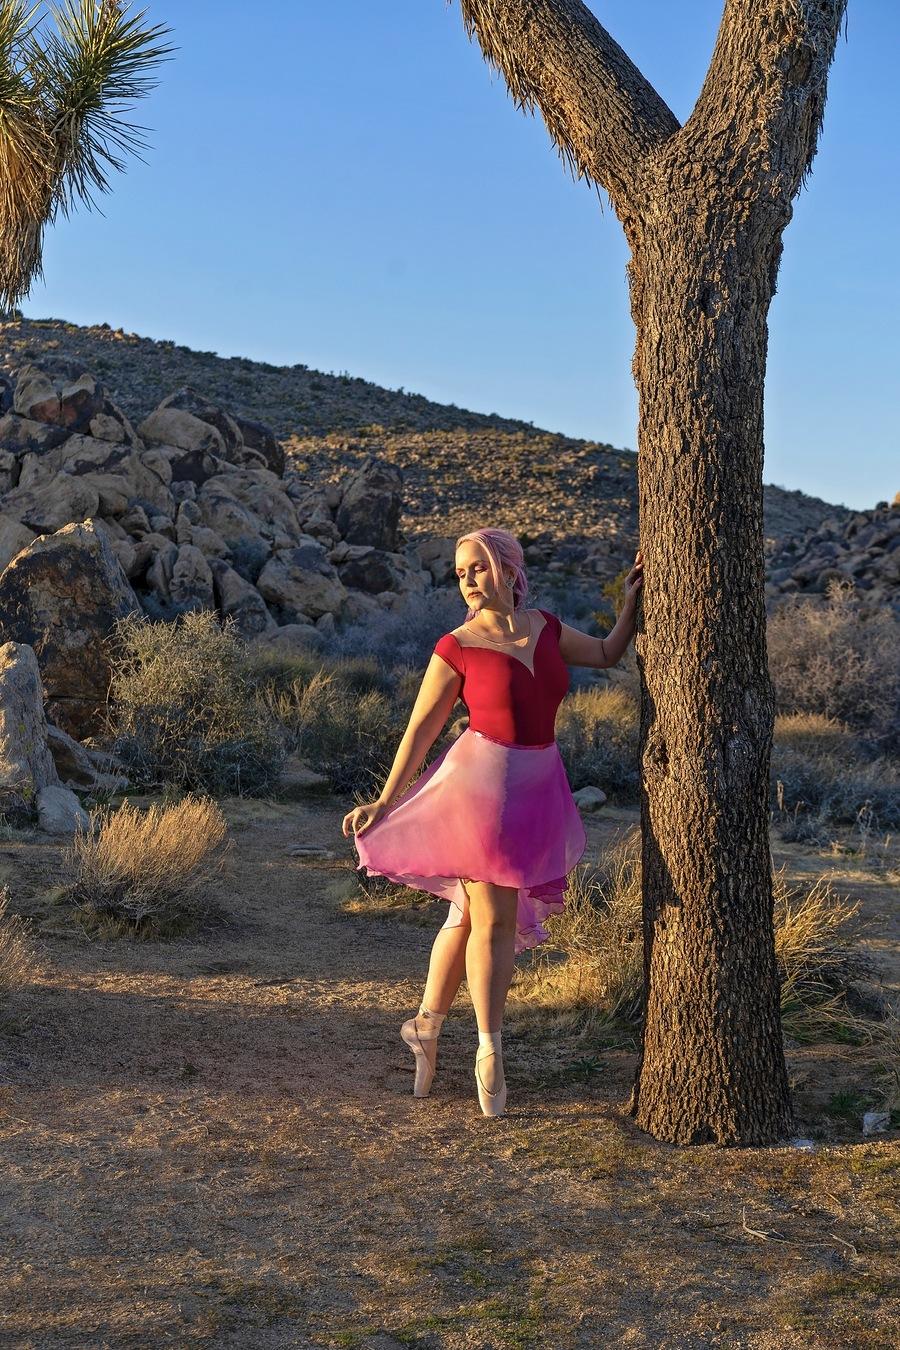 Joshua tree / Model Leanne / Uploaded 25th February 2020 @ 12:15 AM